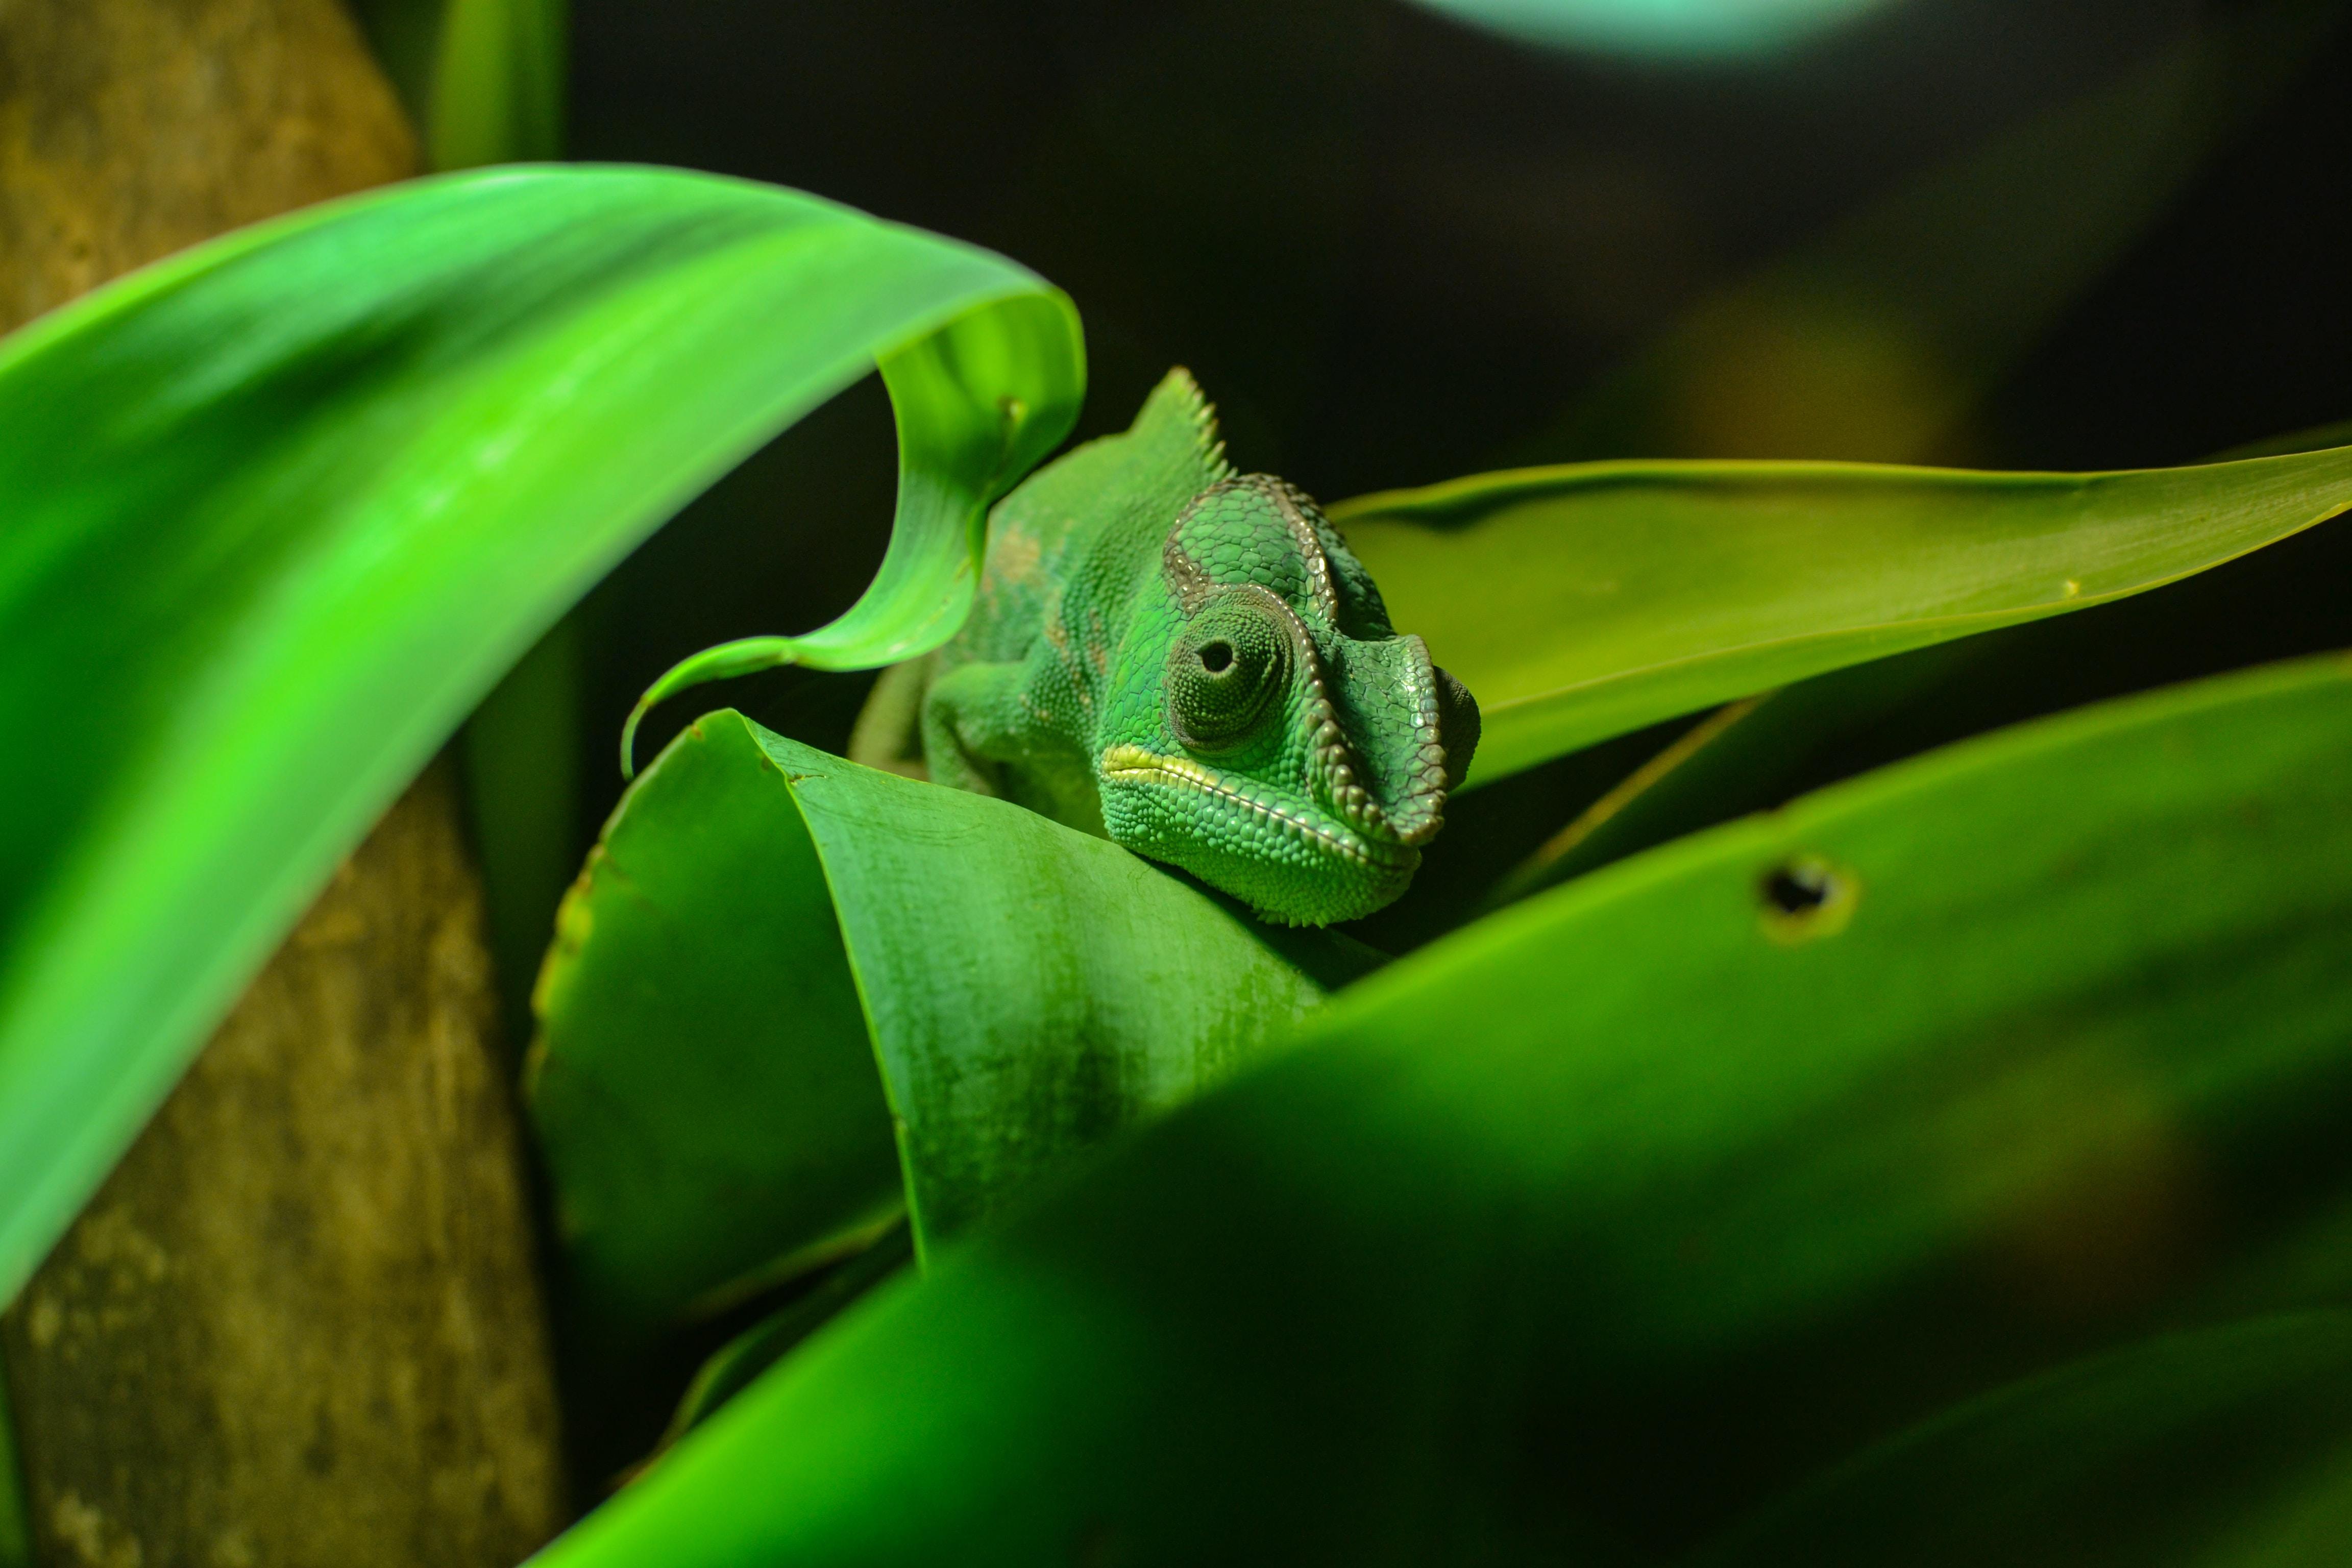 green chameleon on green leaf